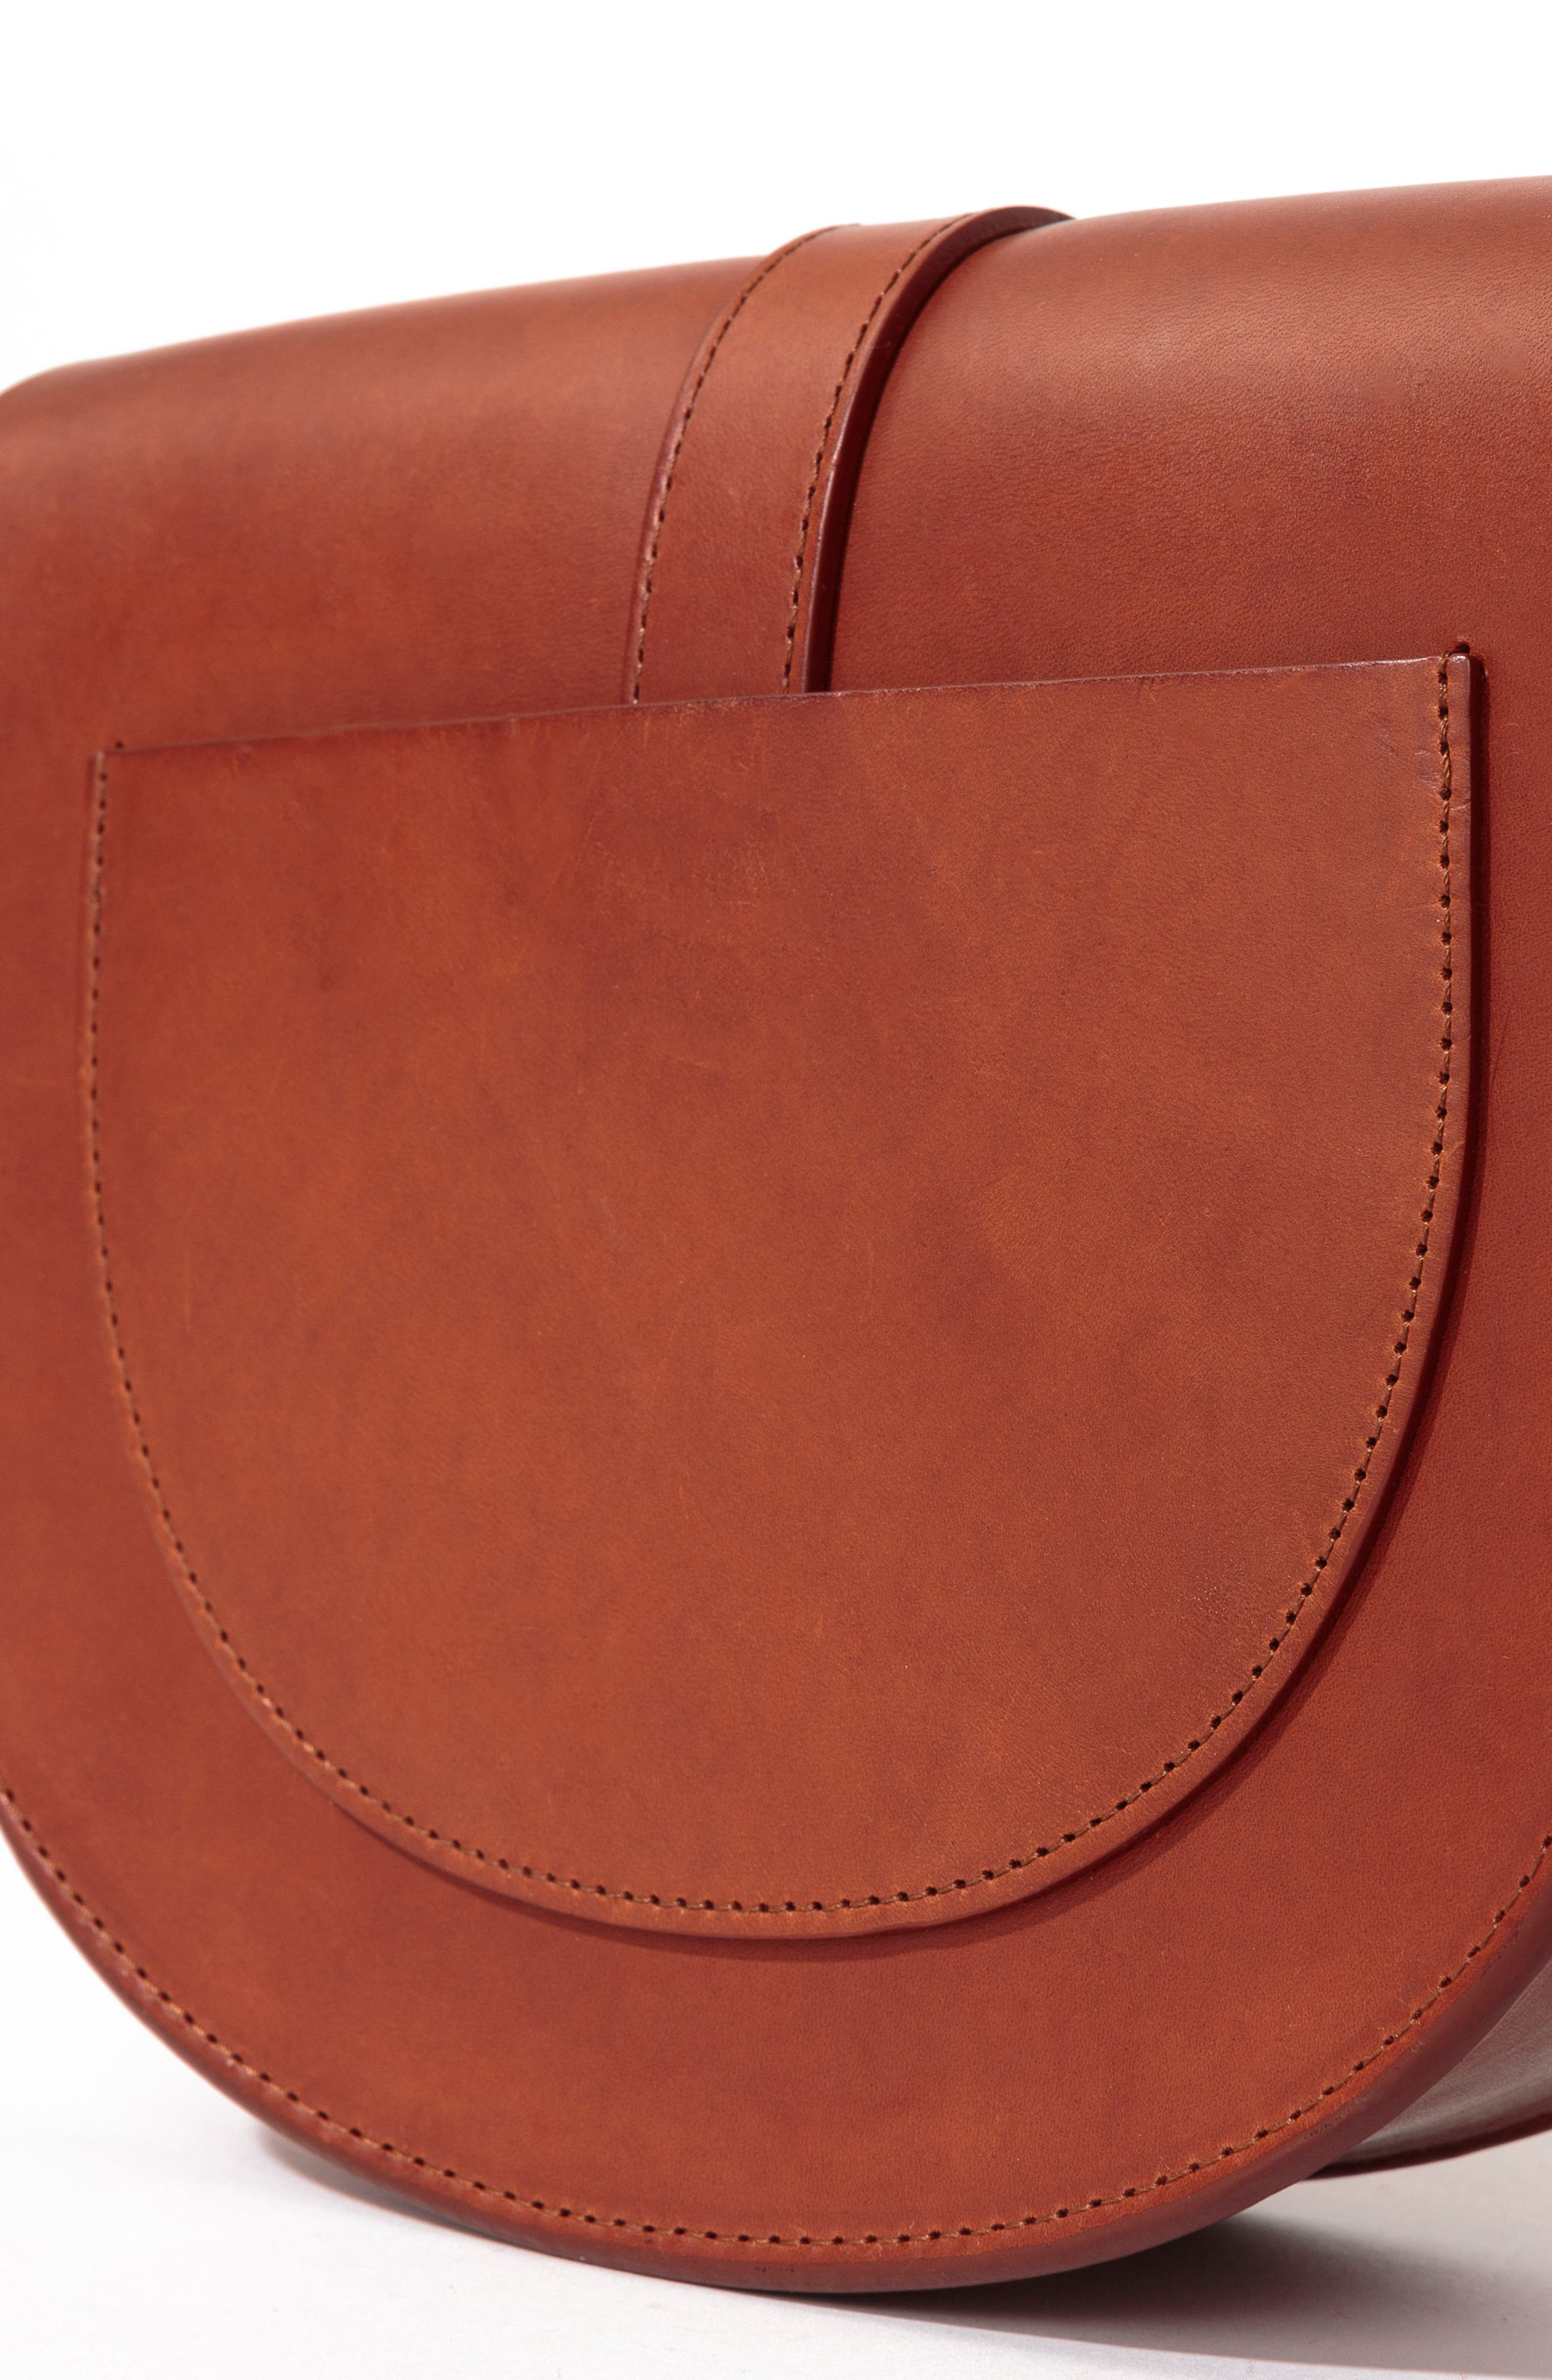 Claude Crossbody Bag,                             Alternate thumbnail 5, color,                             Chocolate